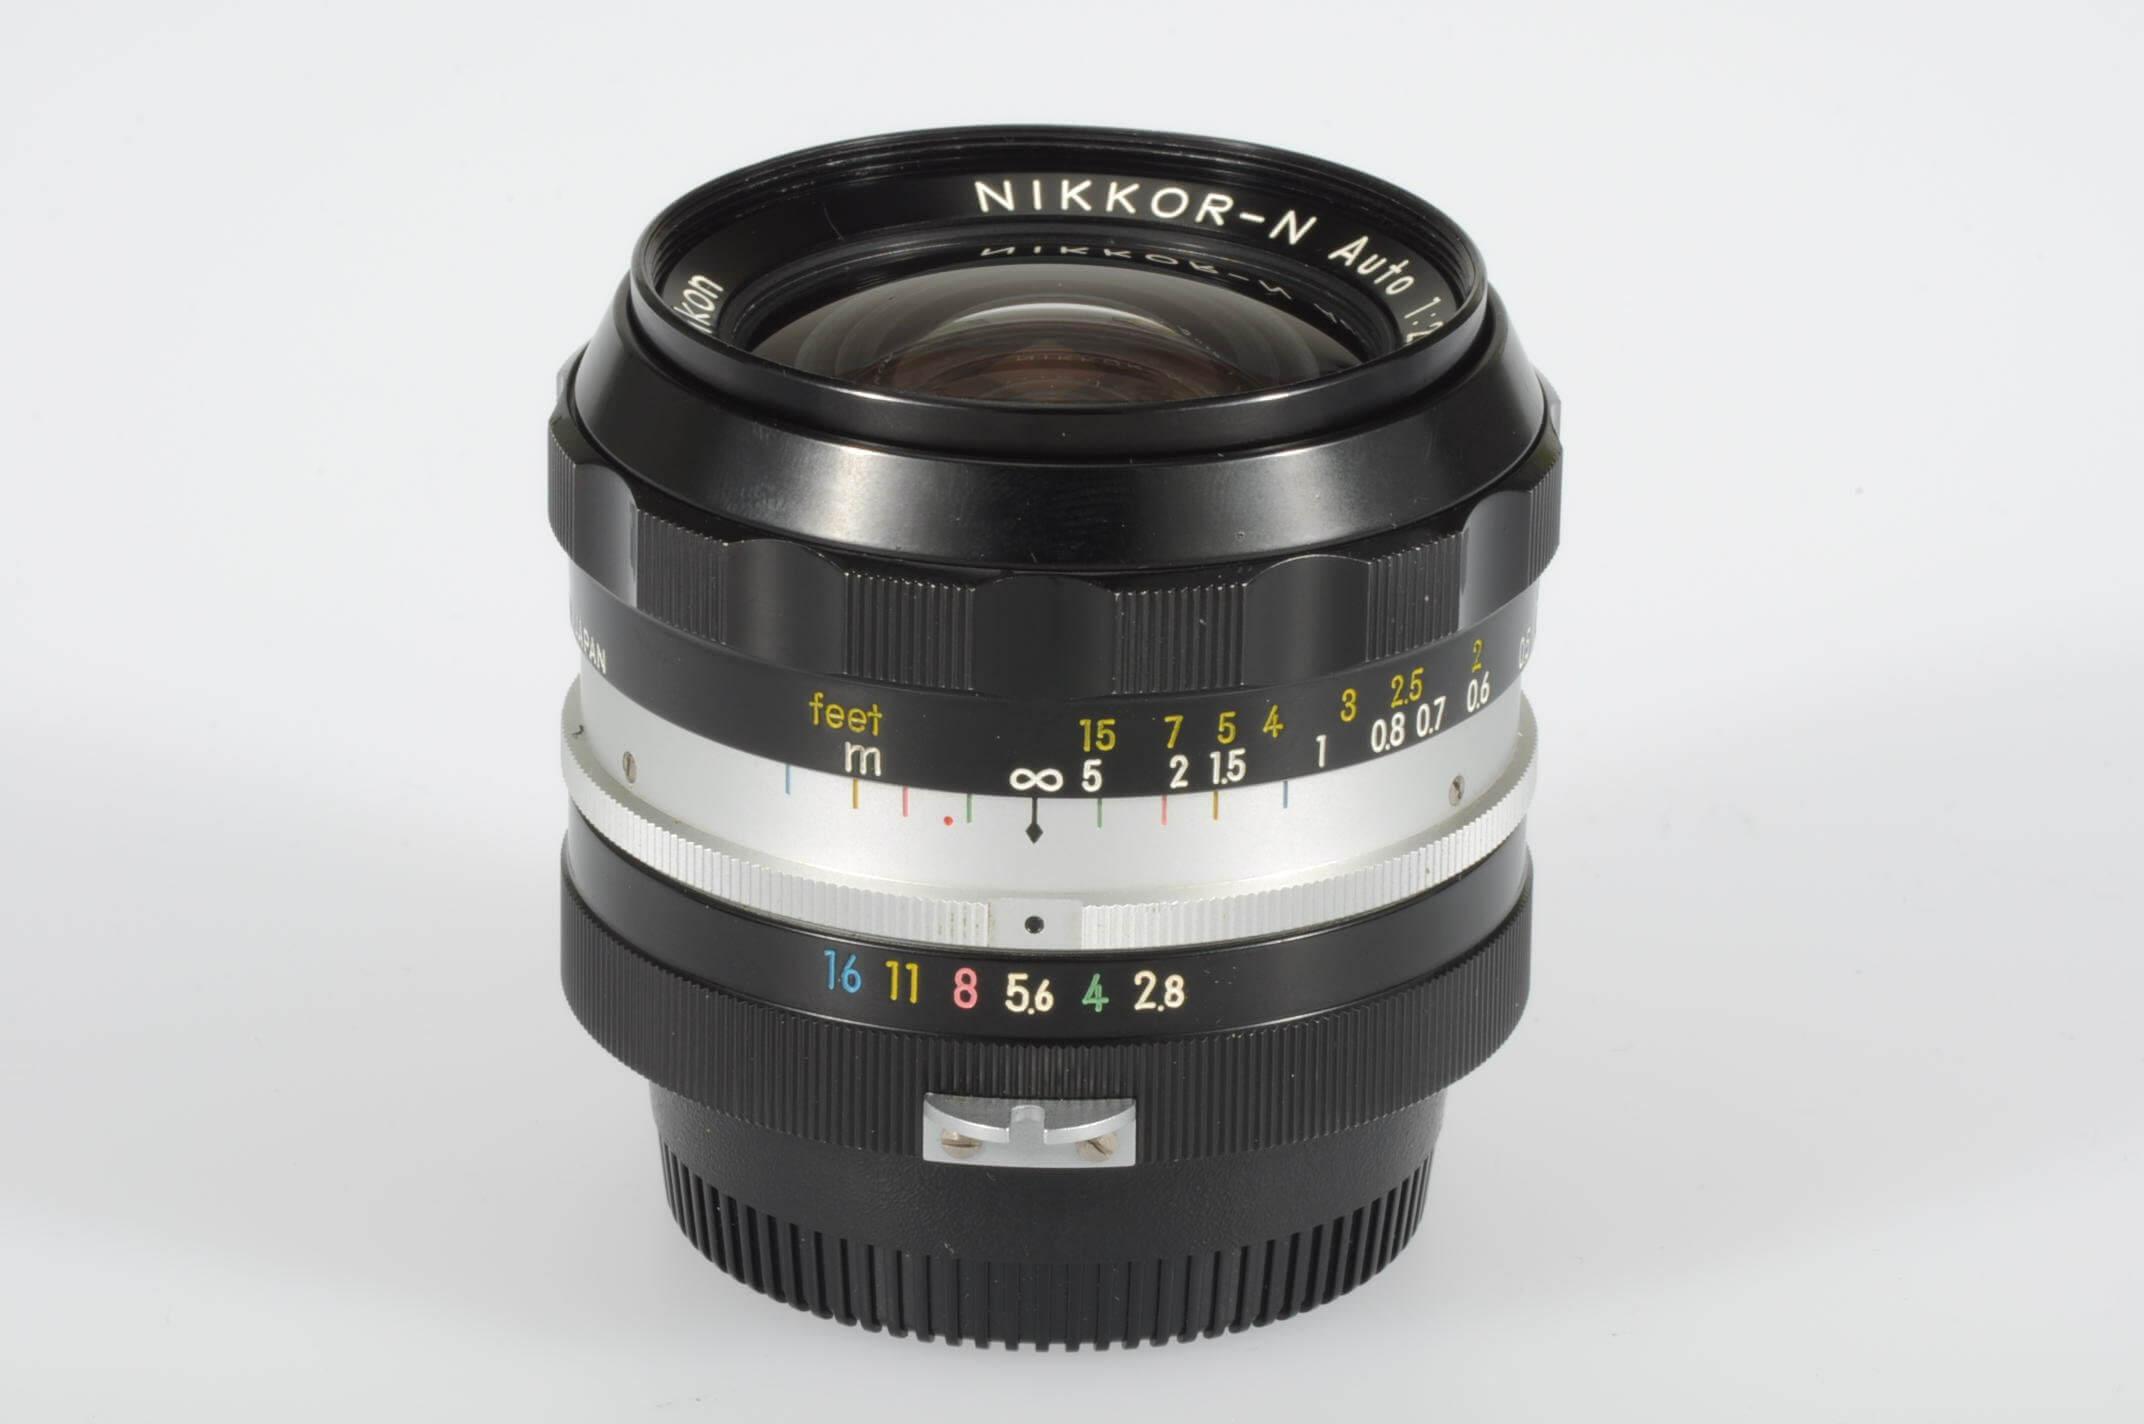 Nikon 24mm f2.8 Nikkor, pre-AI, serviced